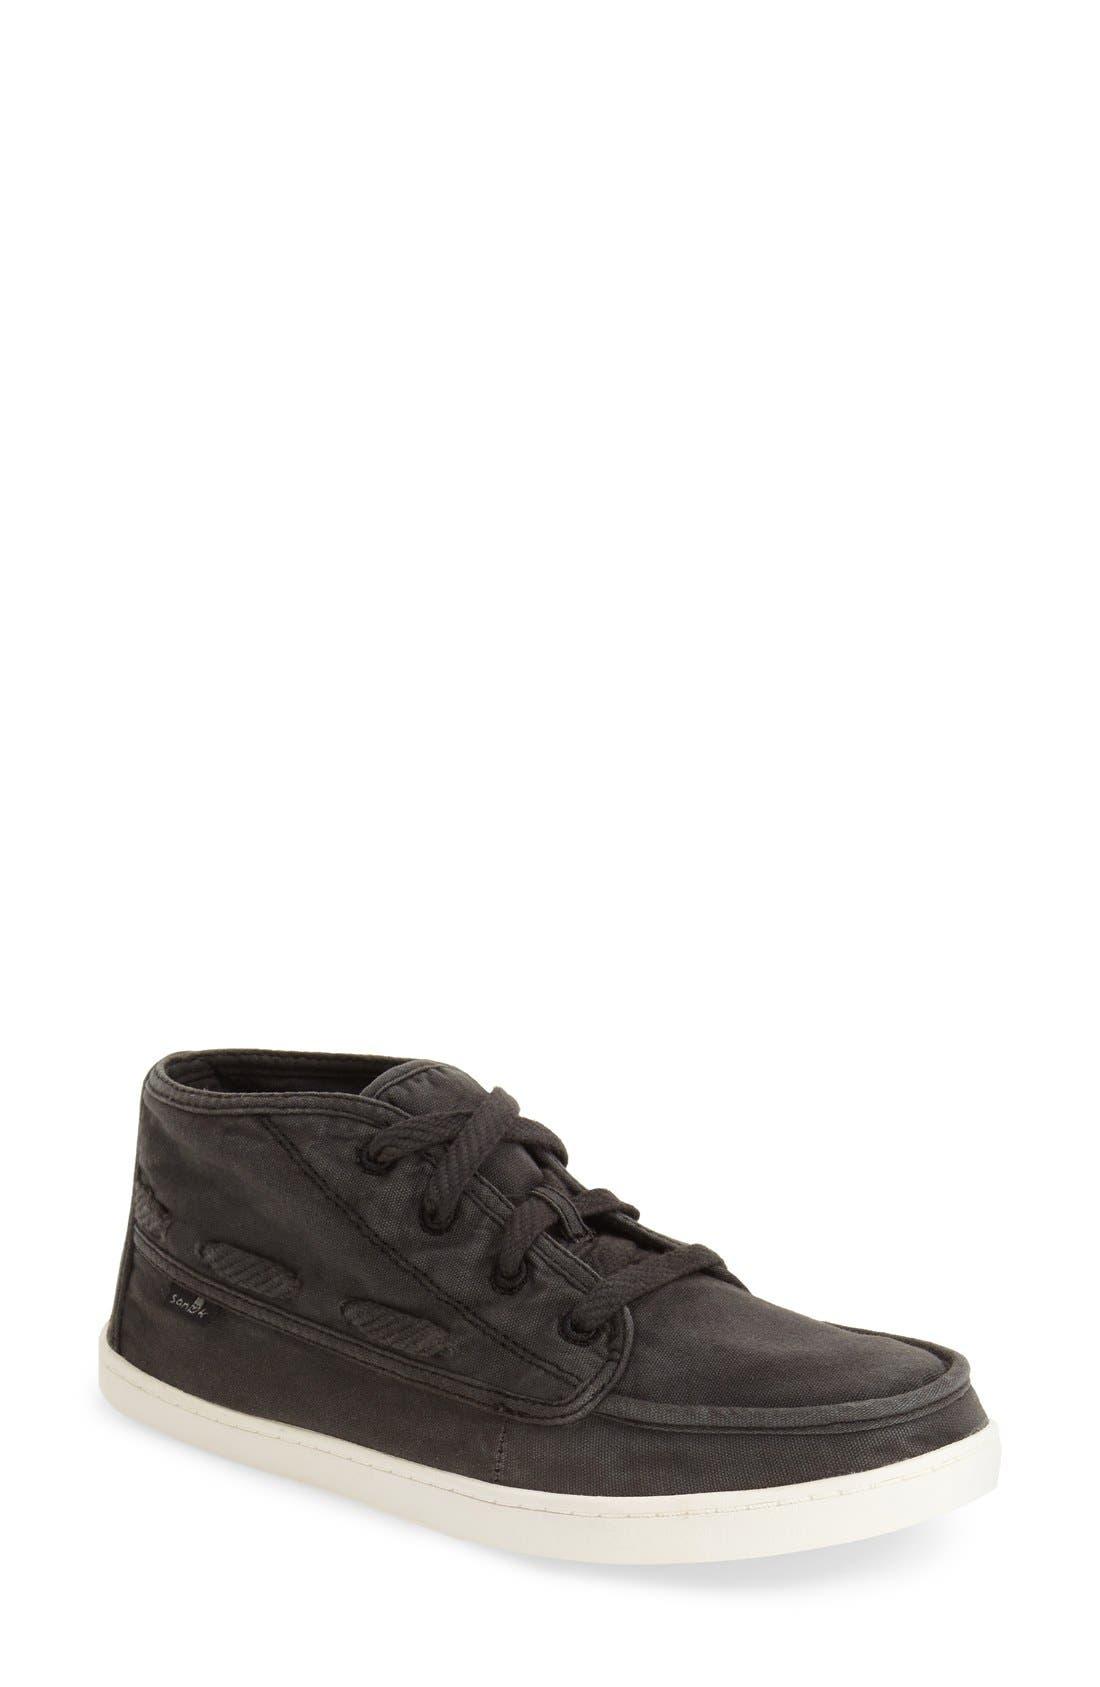 'Vee K Shawn' High Top Sneaker,                             Main thumbnail 1, color,                             006